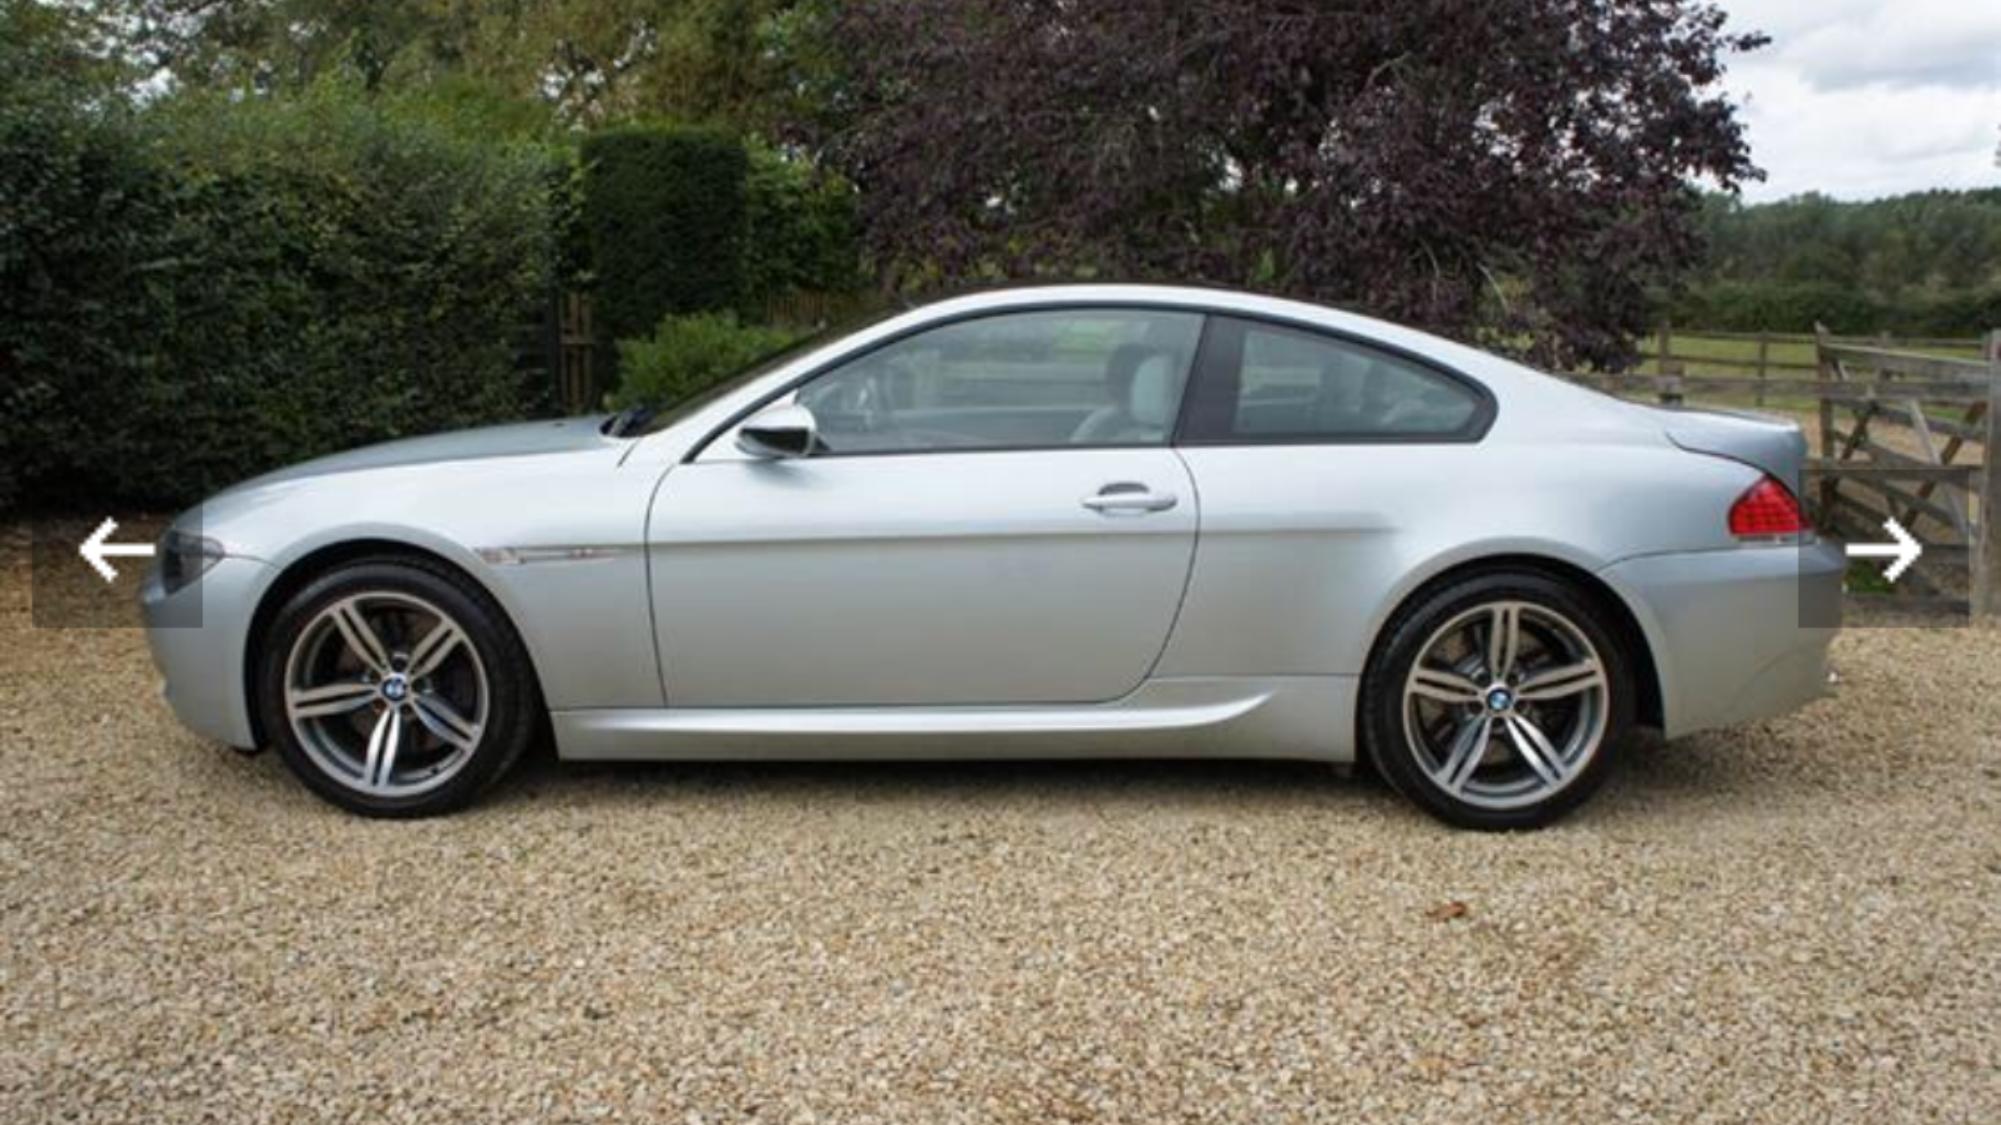 2007 BMW M6 V10 5.0 LOW MILEAGE - HUGE SPEC SOLD (picture 3 of 6)